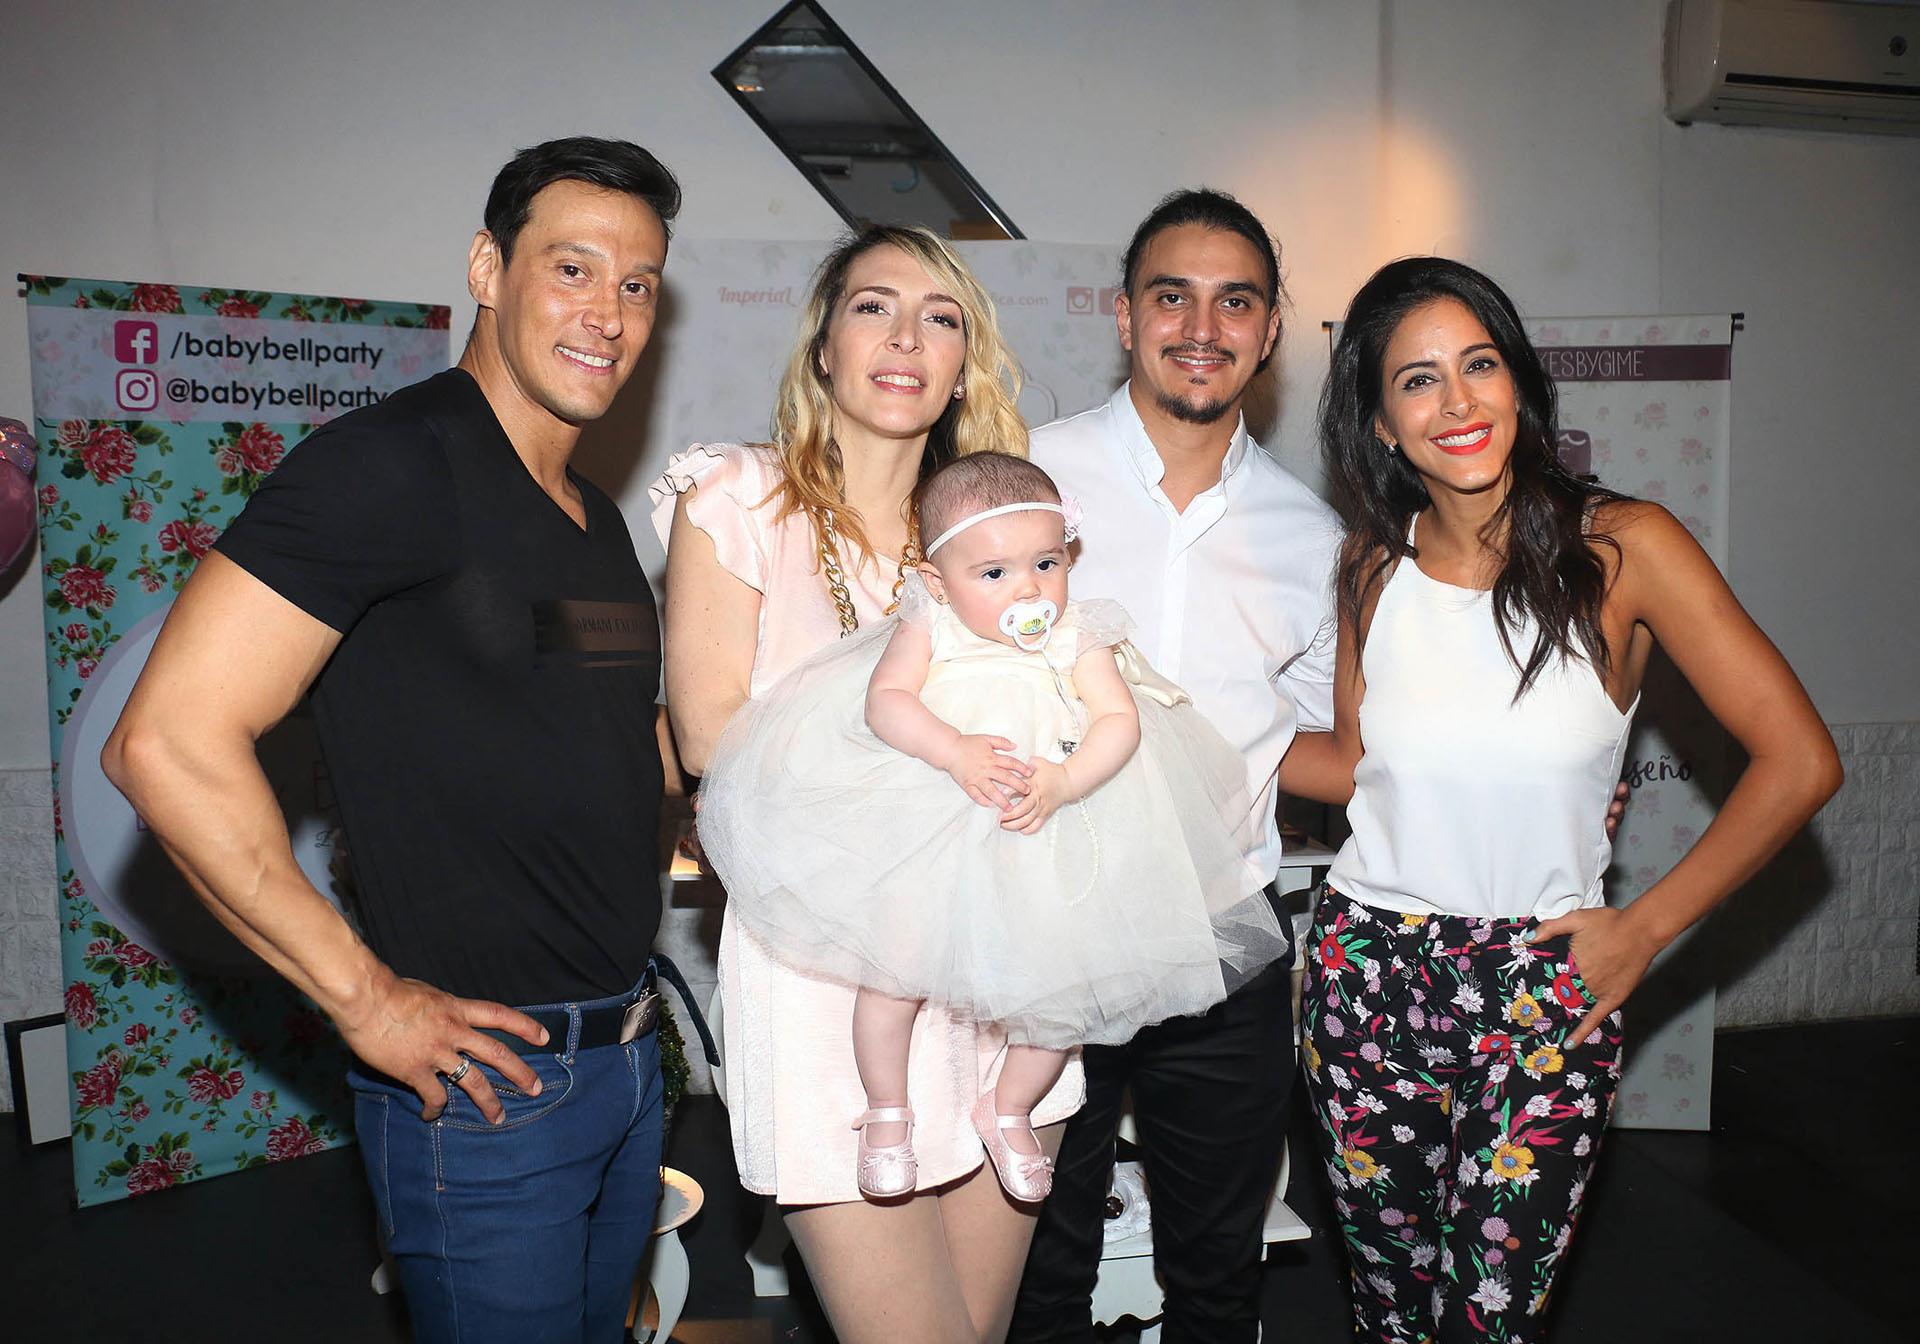 Joel Ledesma, Lorena Liggi, Leandro D´Angelo y Celeste Muriega con Indiana